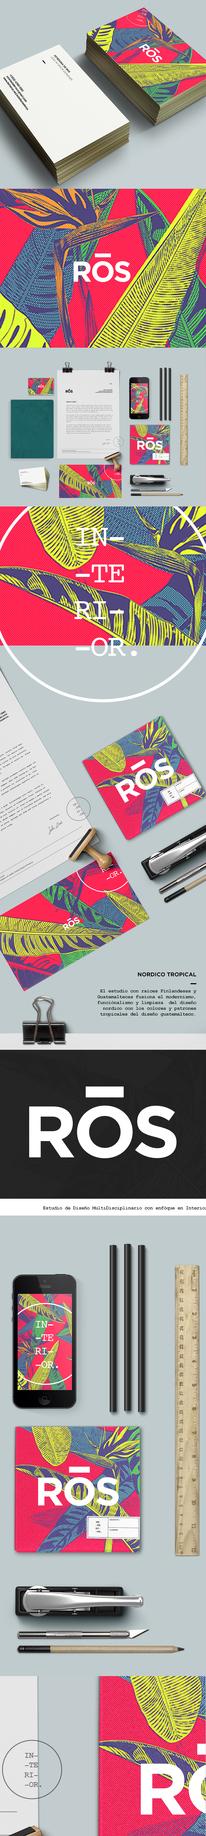 Designspiration — Design Inspiration | BRAND | Showcase ...